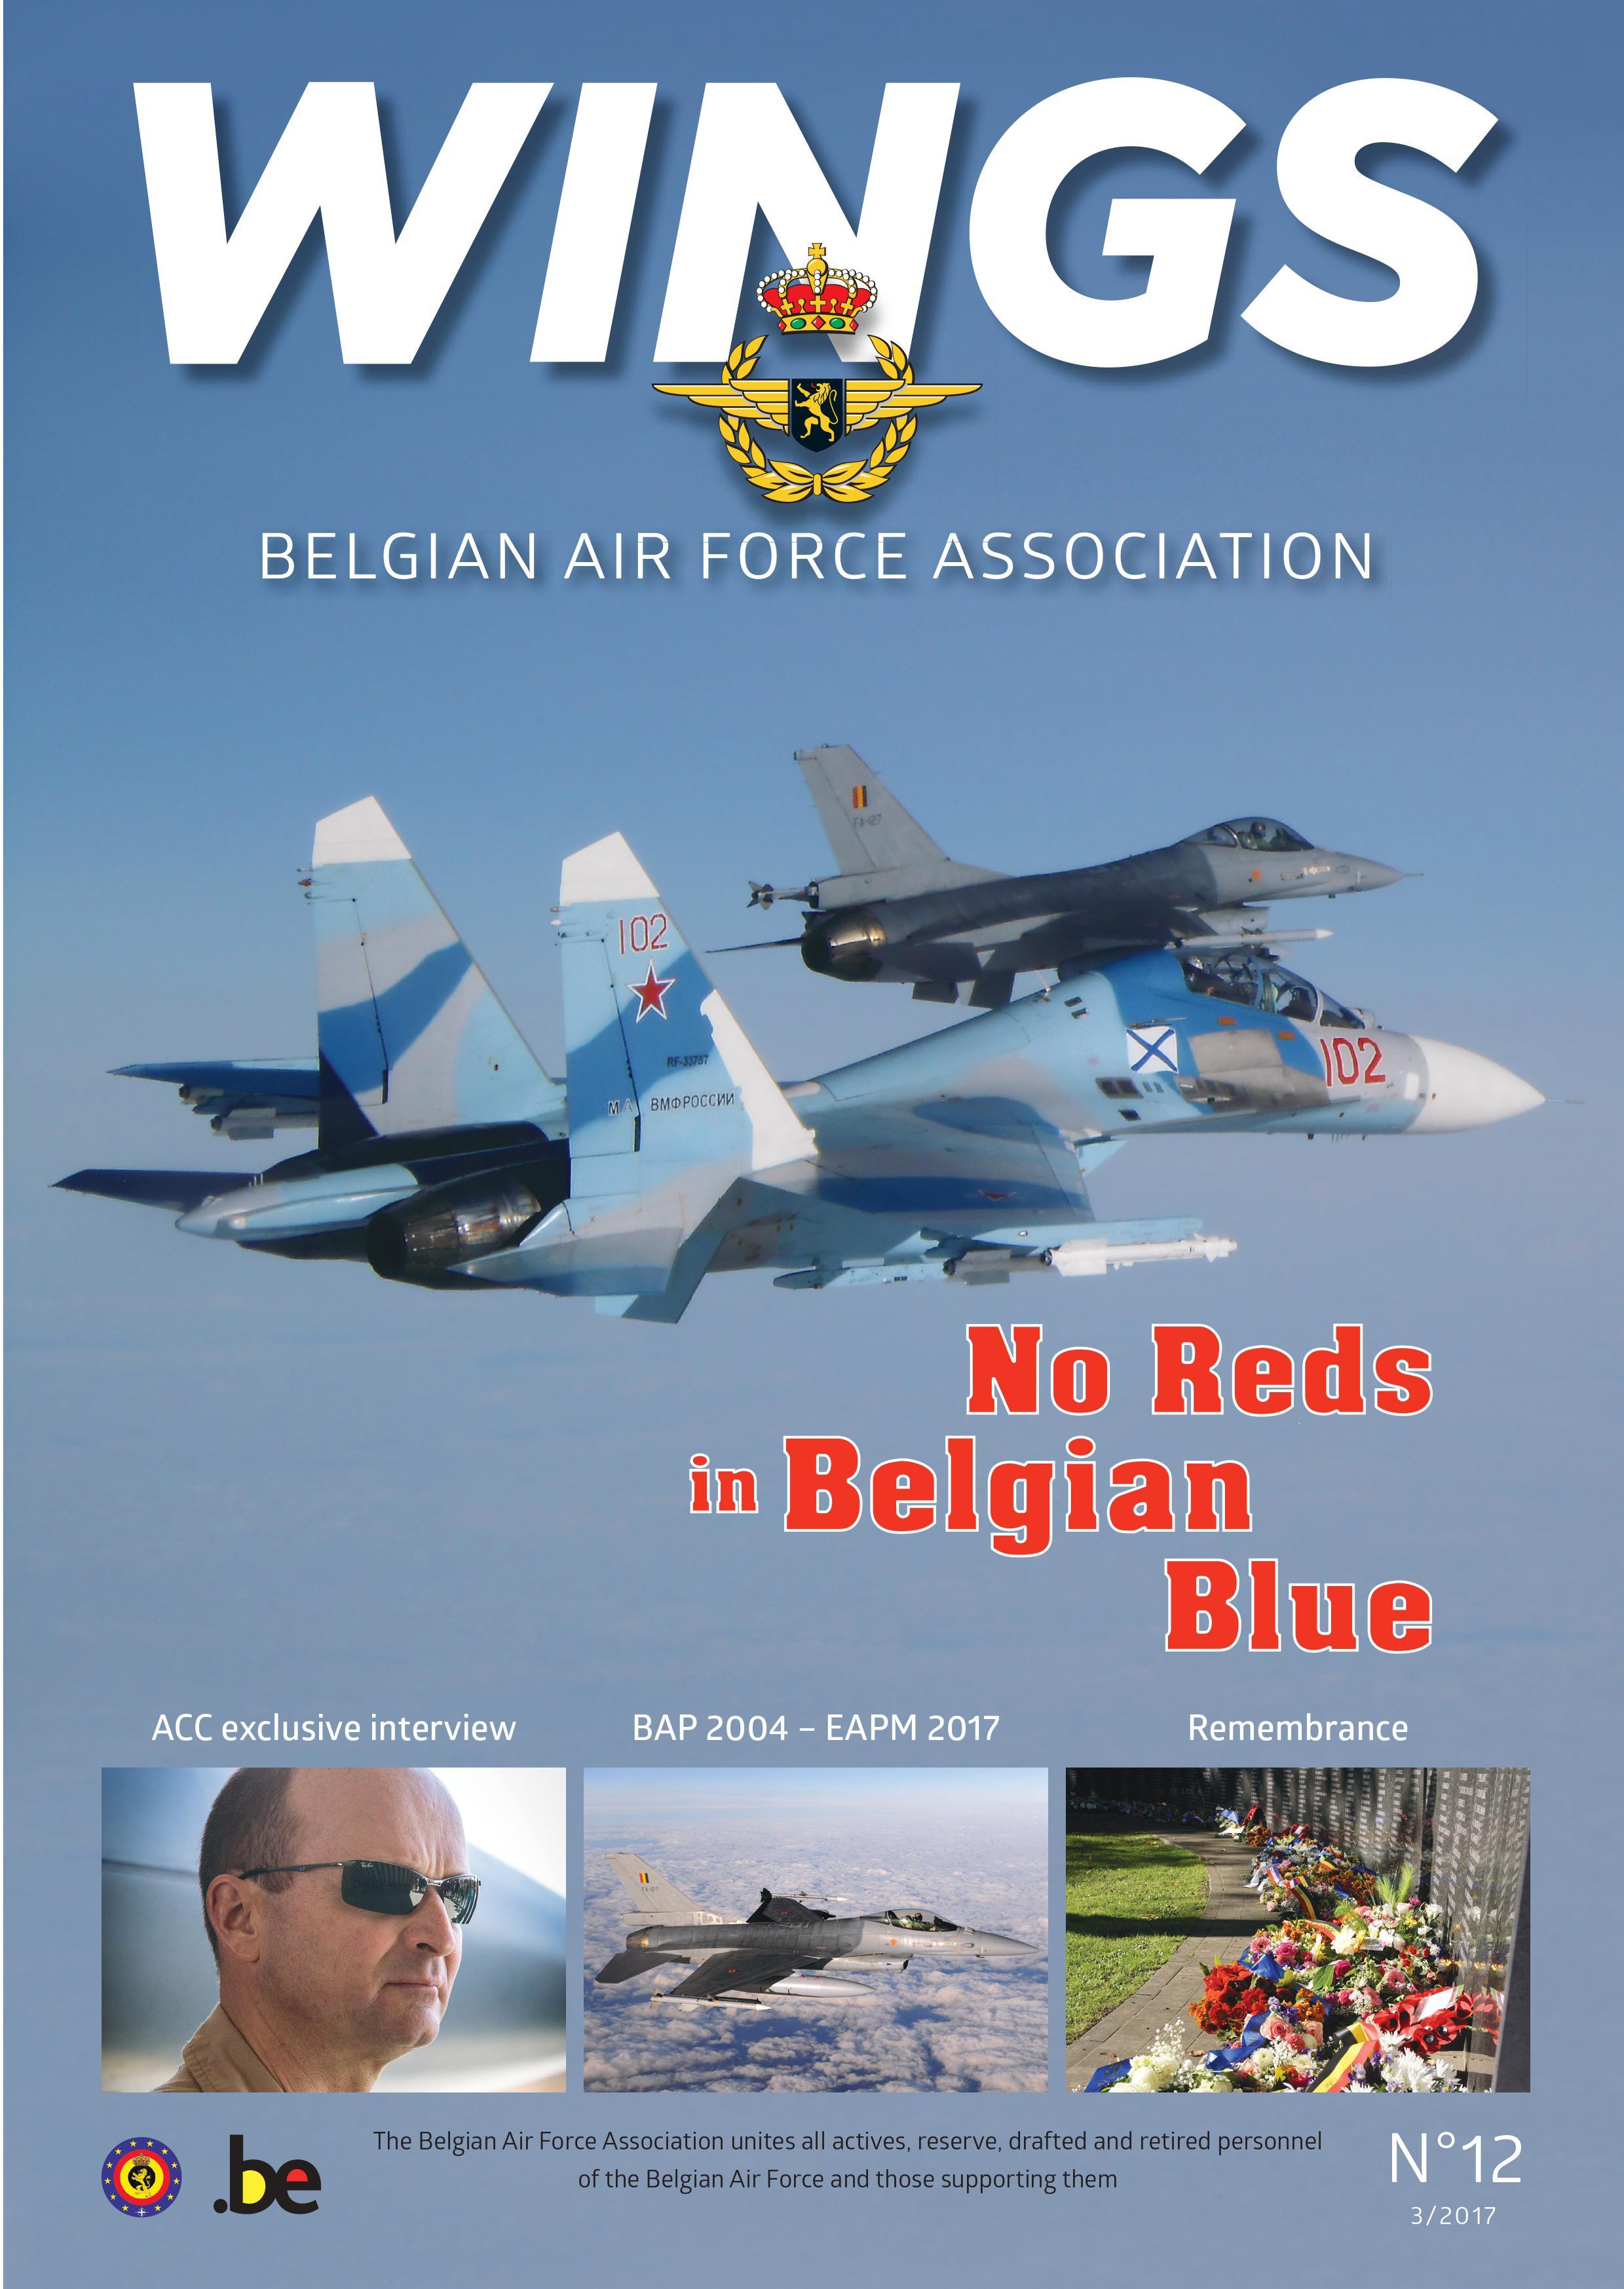 Wings 12 - Belgian Air Force Association